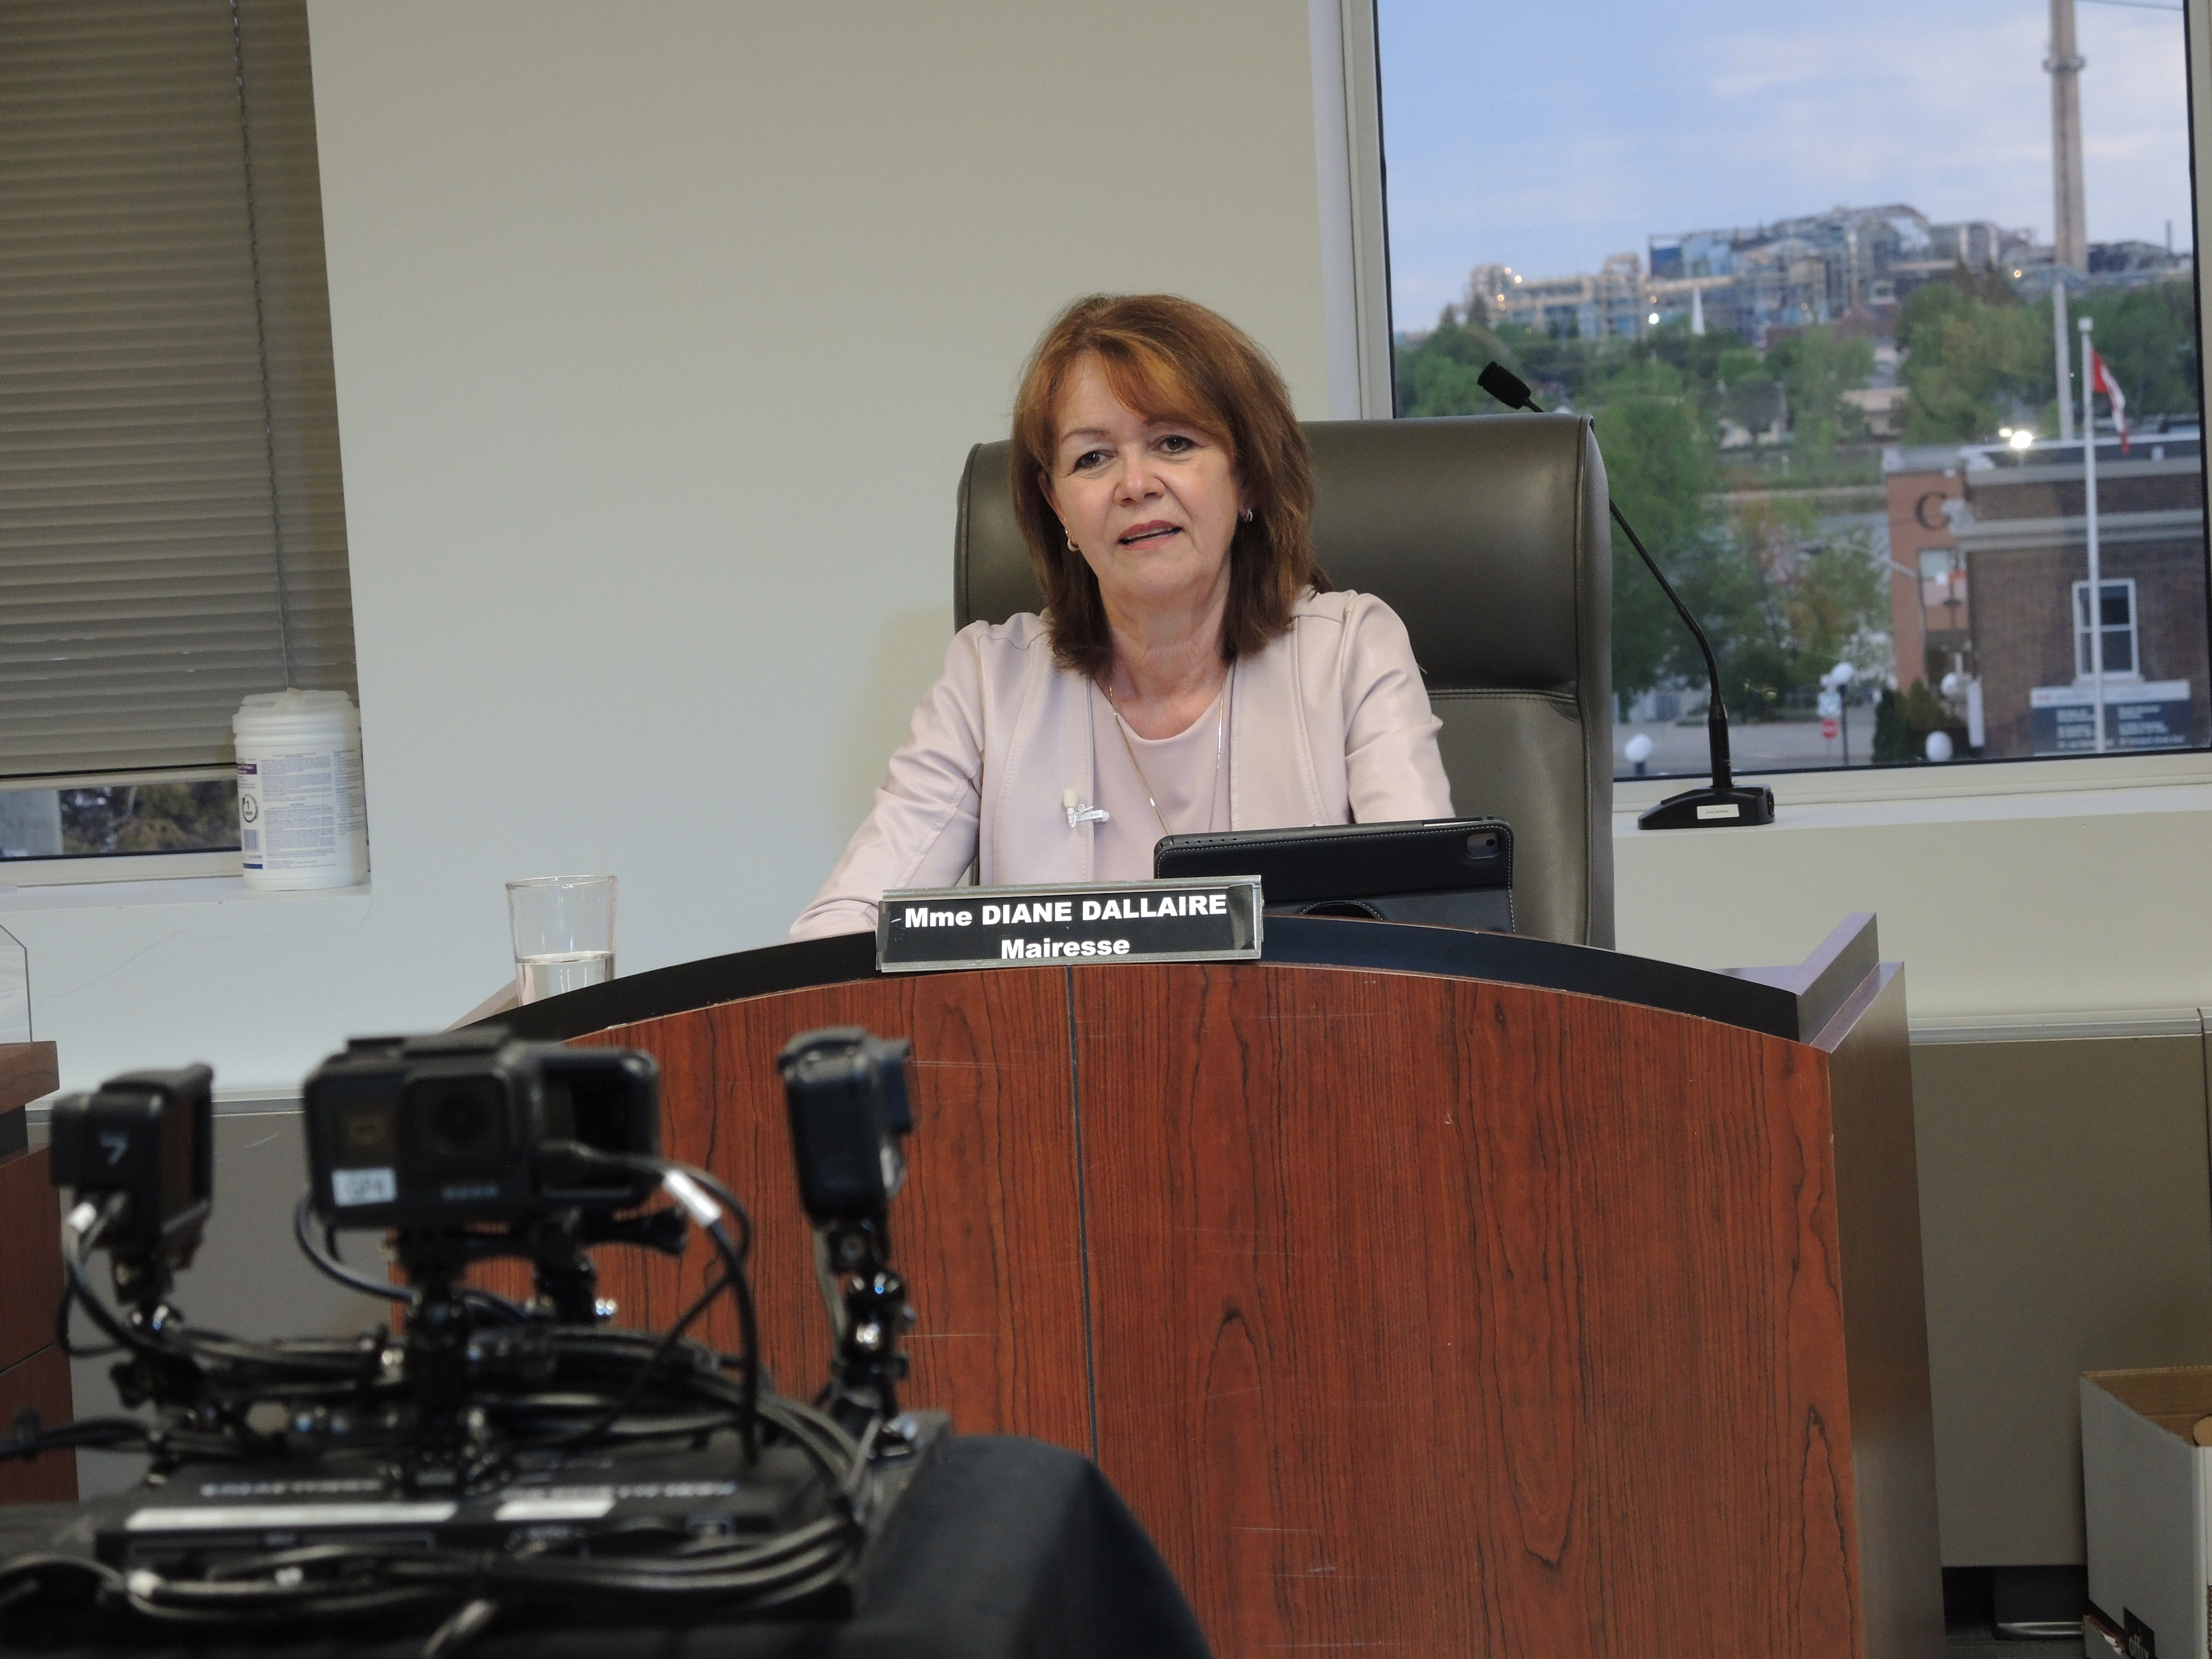 Diane Dallaire mairesse de Rouyn-Noranda 31 mai 2021